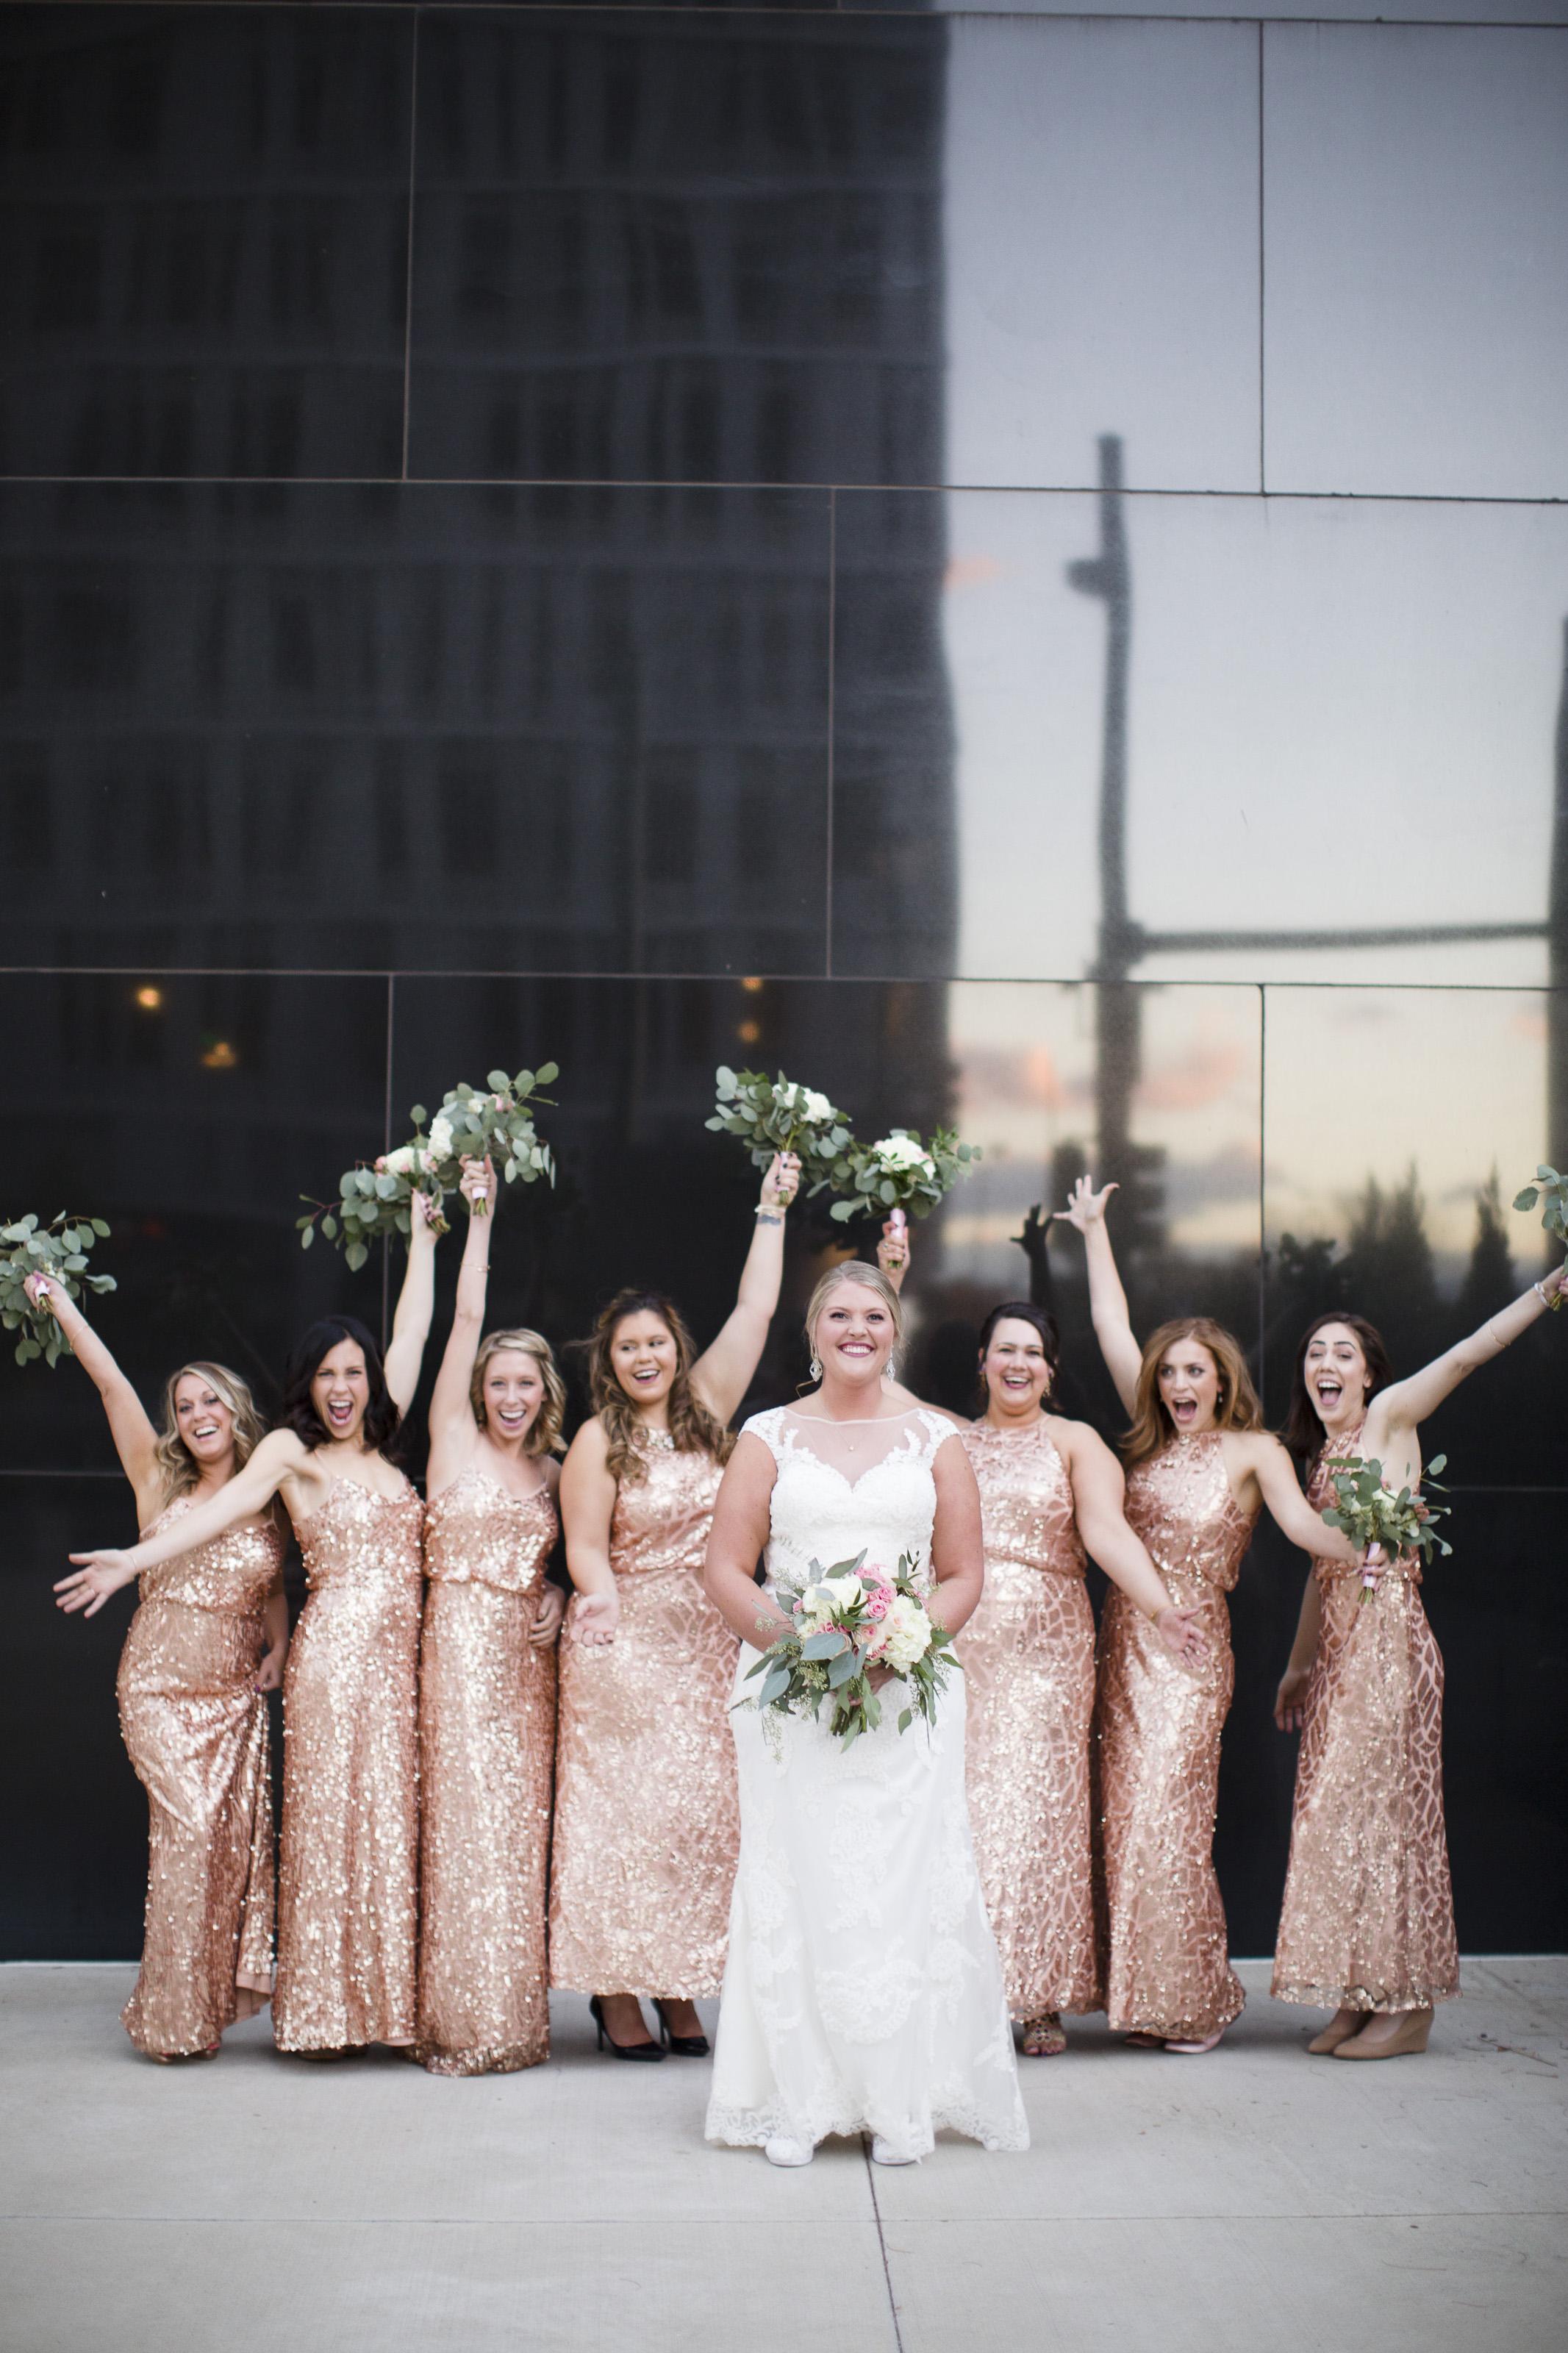 kristen-vance-downtown-denver-colorado-winter-wedding-2017.jpg